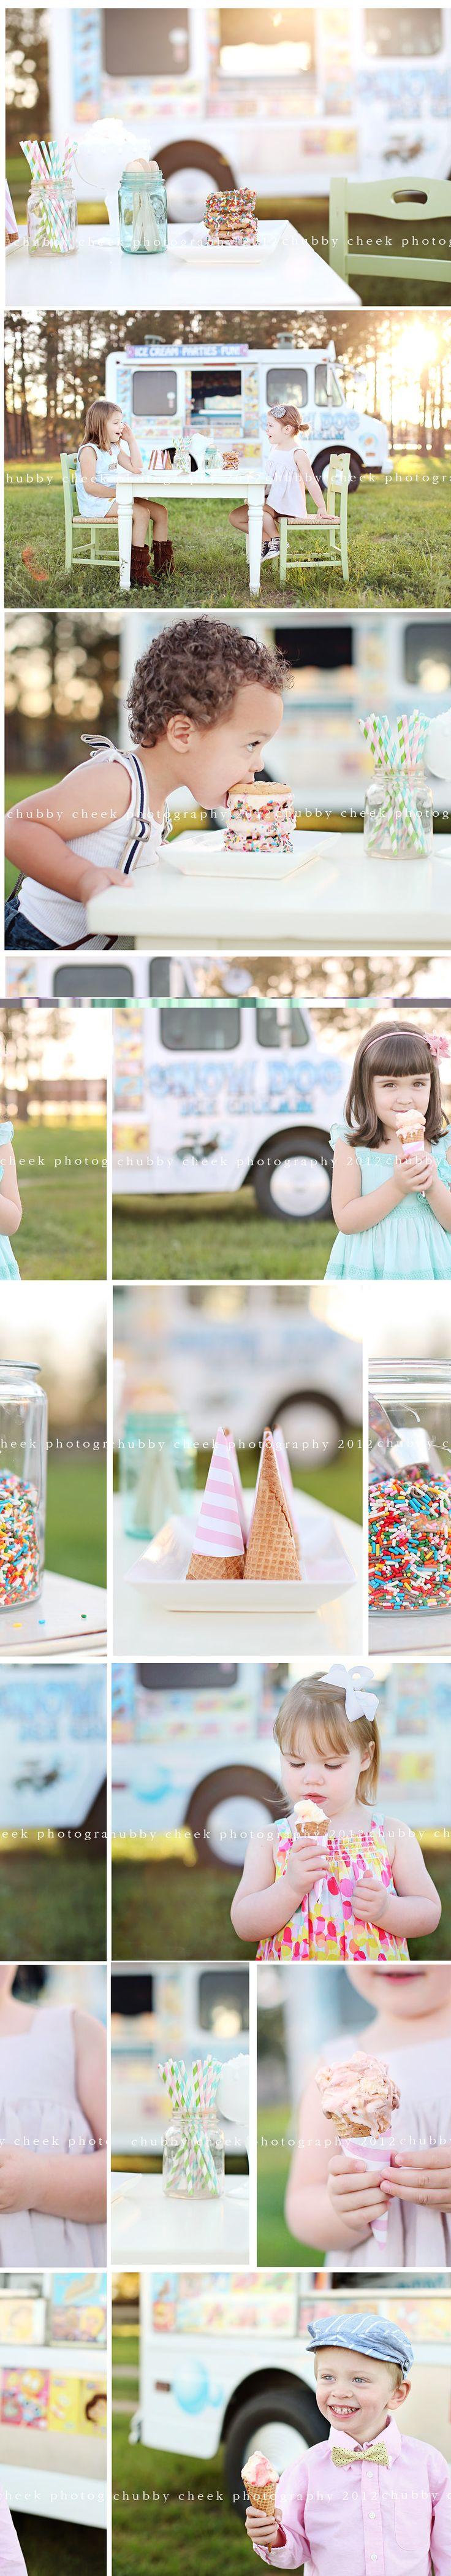 Chubby Cheek Photography, ice cream mini sessions